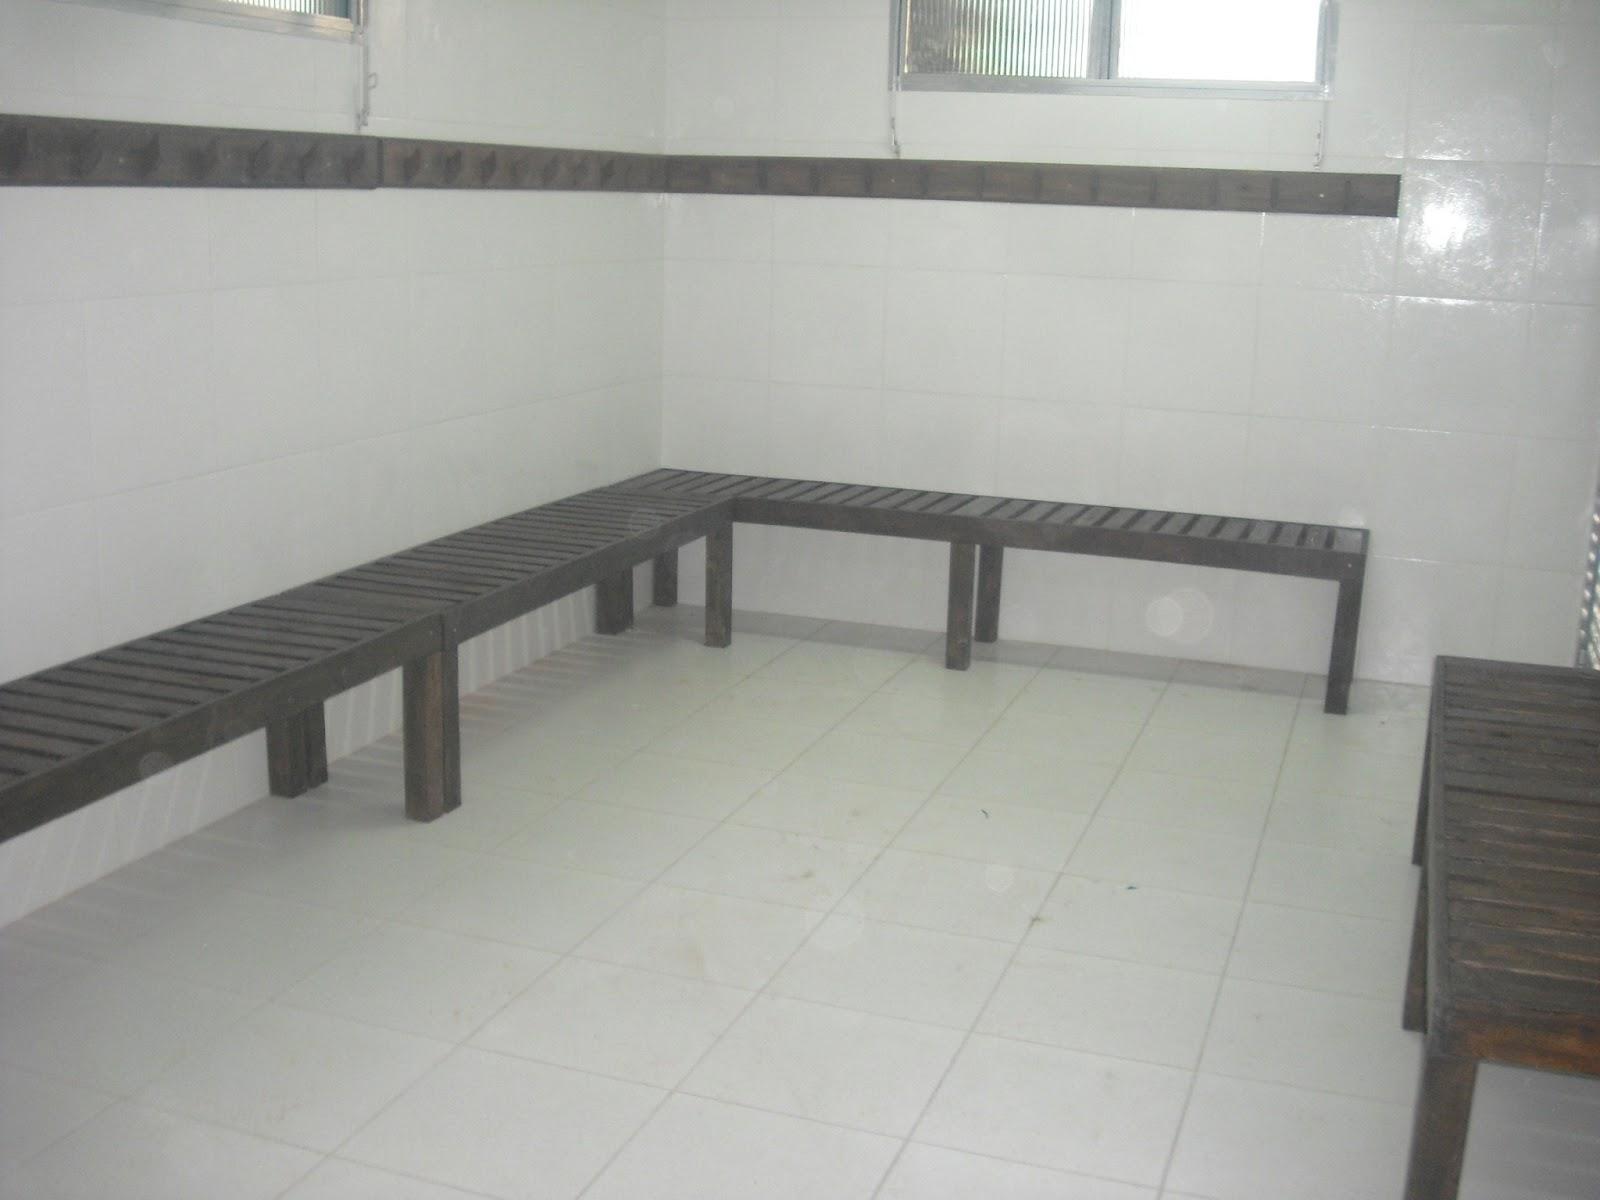 JP Cadeiras Artesanais: bancos de madeira maciça para vestiario #57514A 1600x1200